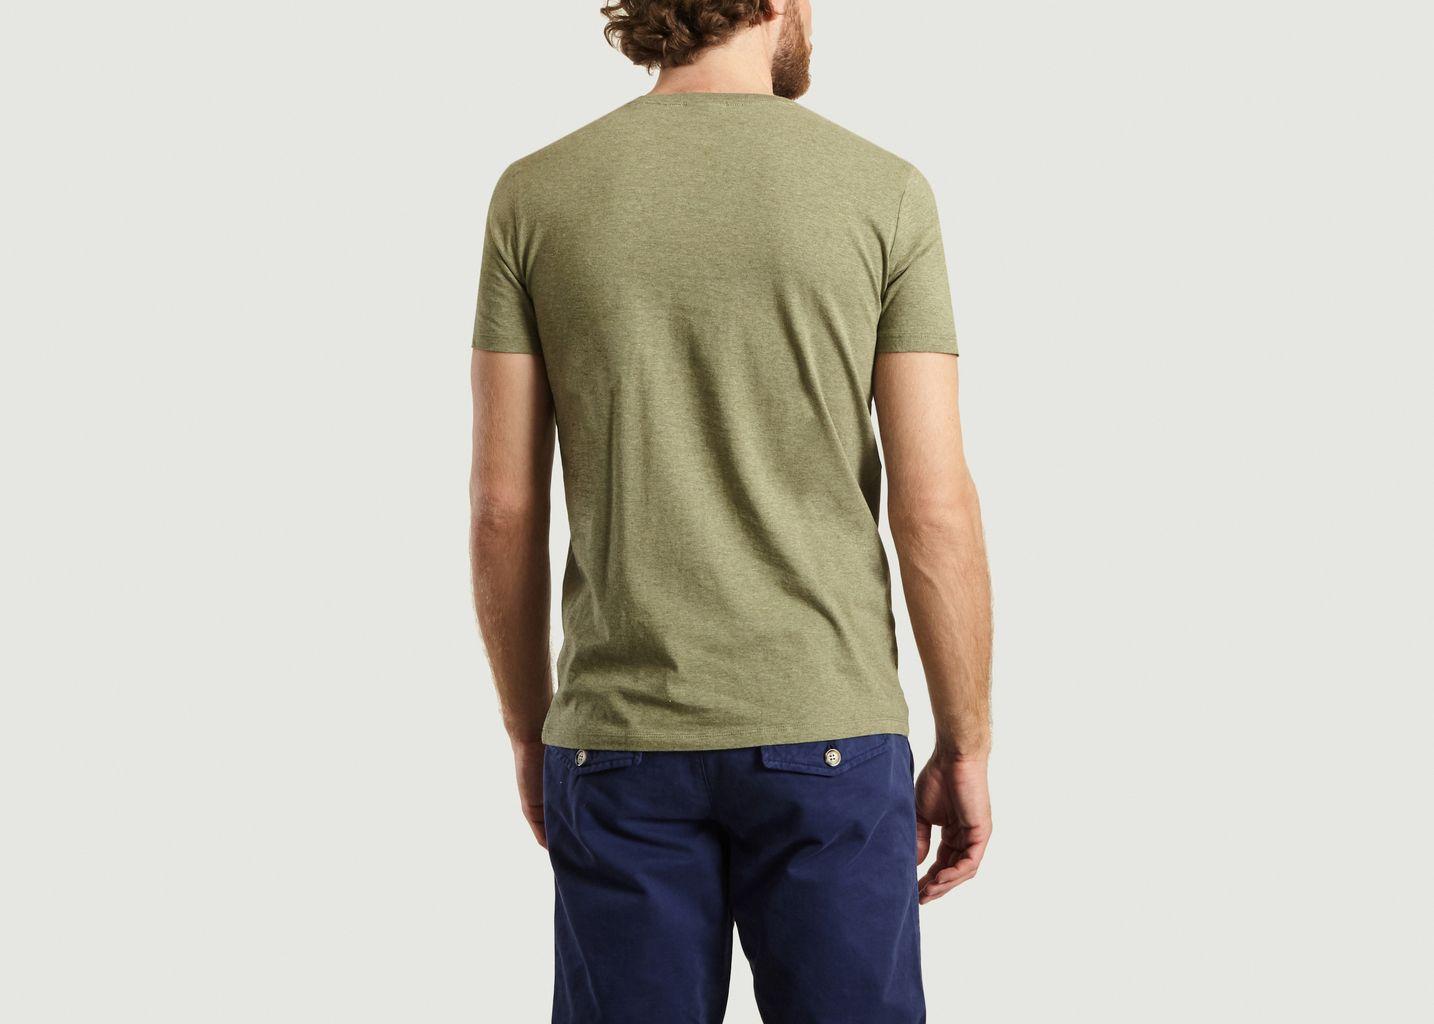 T-Shirt En Coton Bio Brodé Mimosa - Johnny Romance